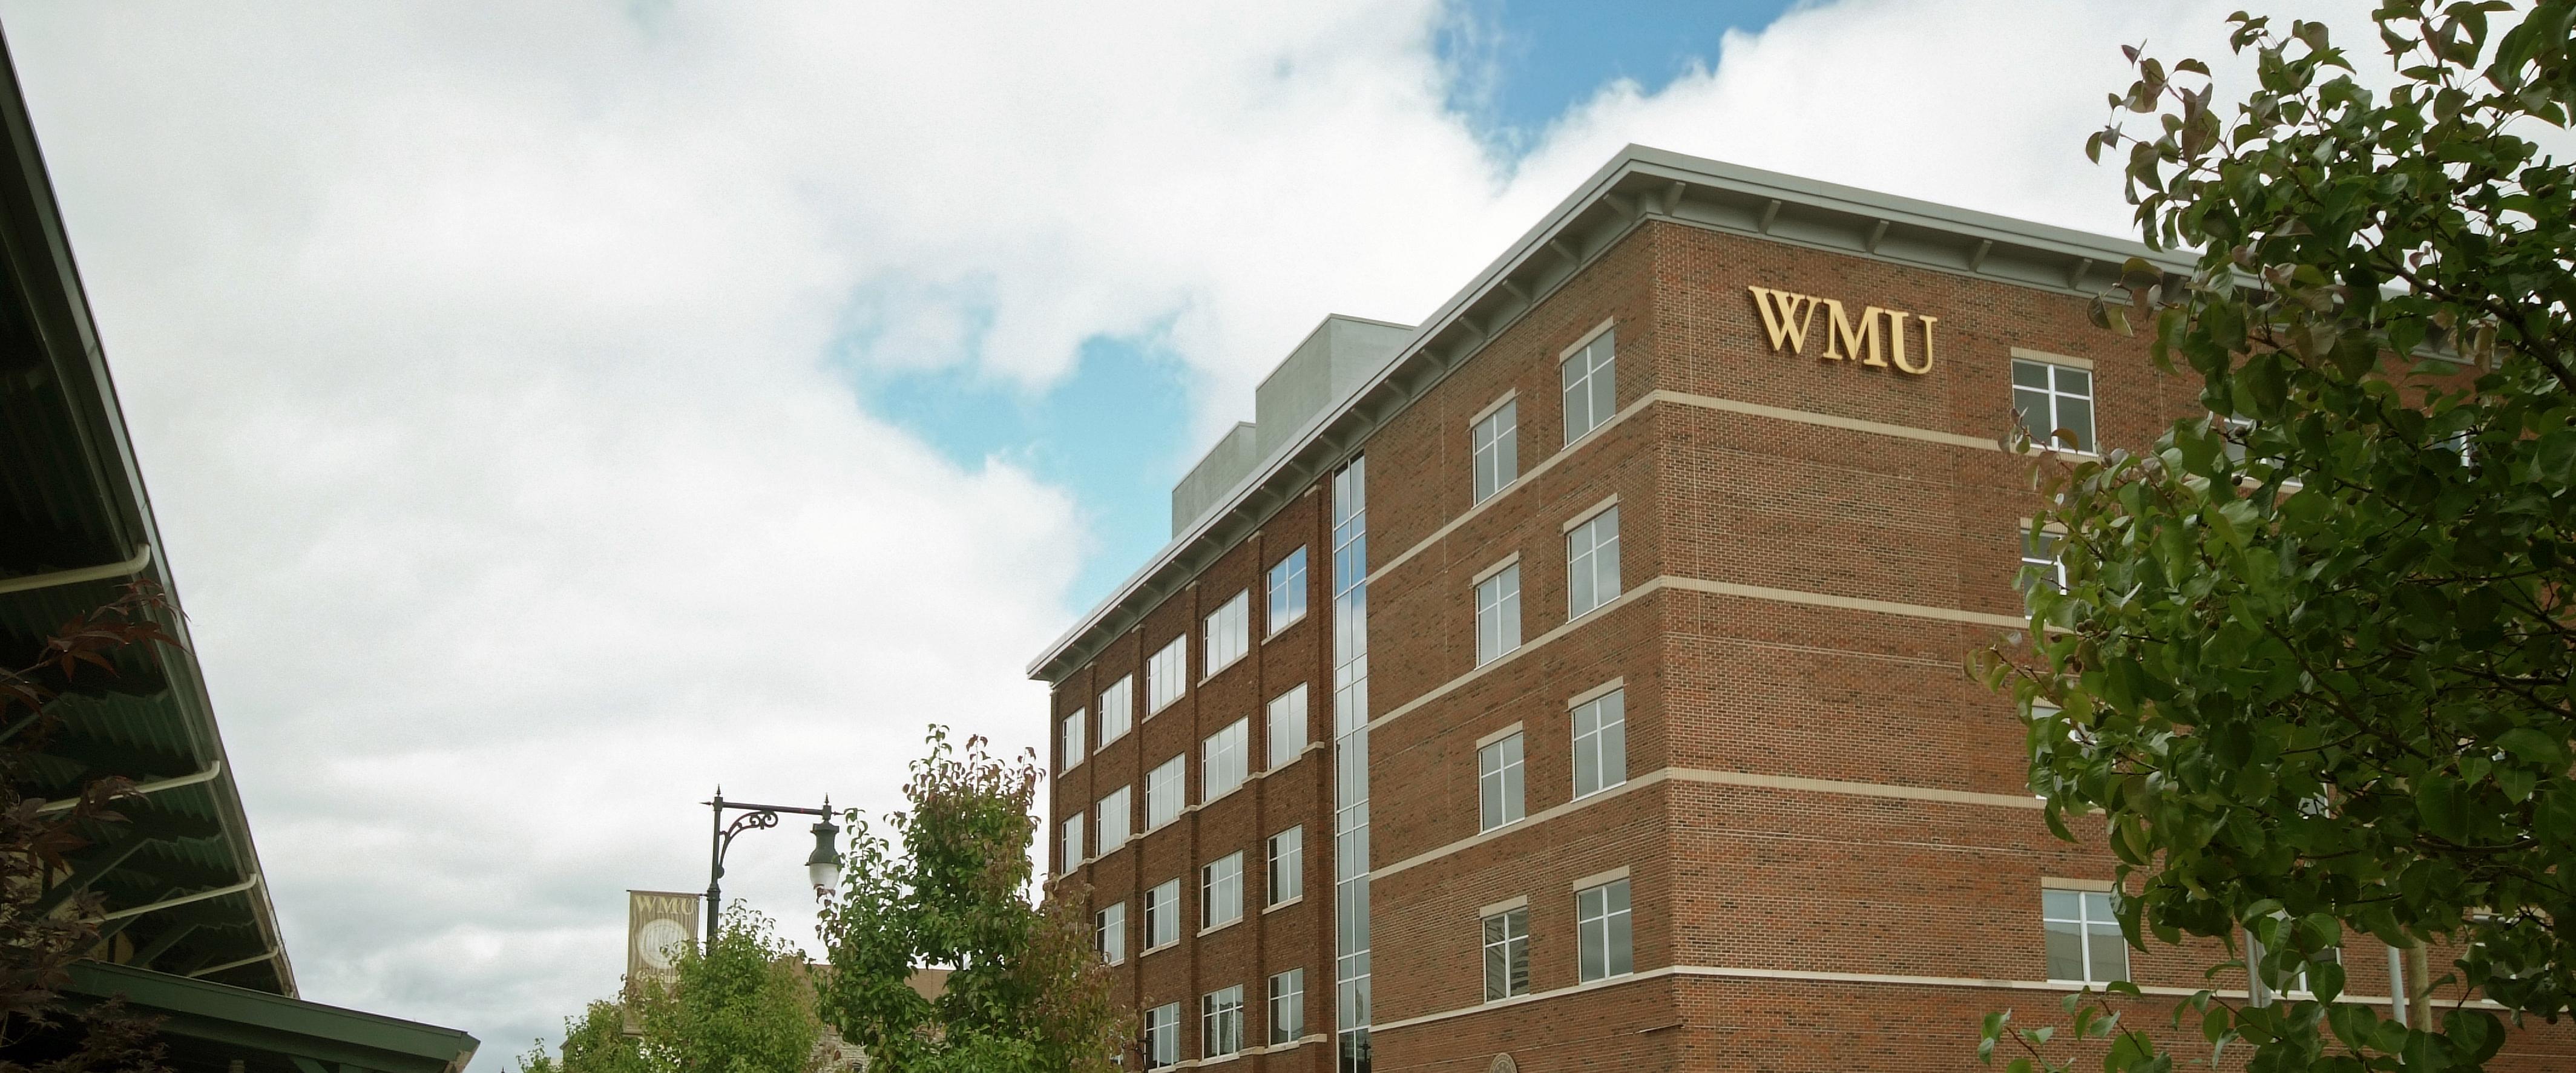 Photo of WMU downtown Grand Rapids.